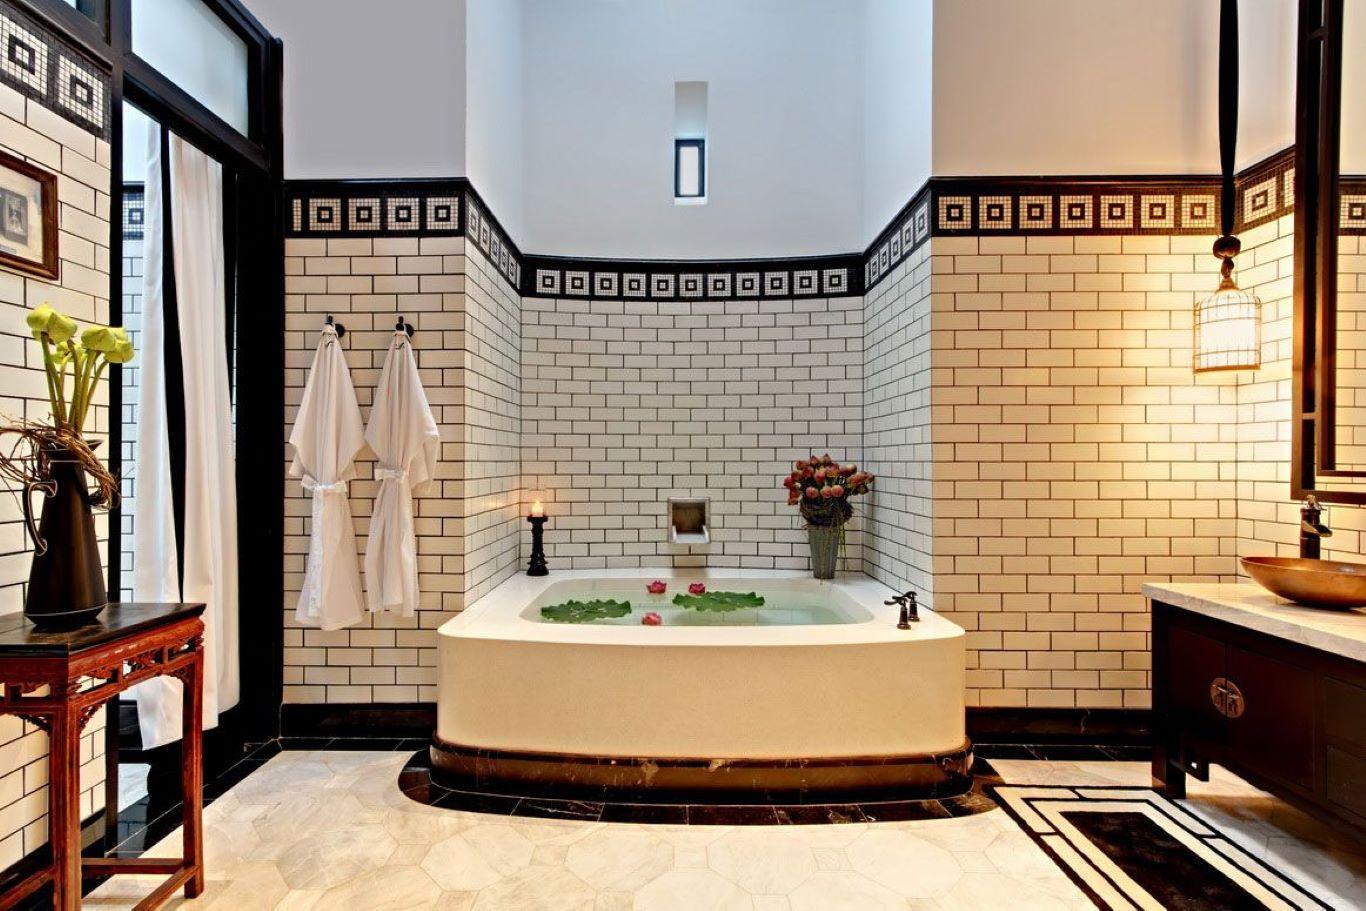 Single bathtub bathroom with Oriental Chinese wood furniture and wall design